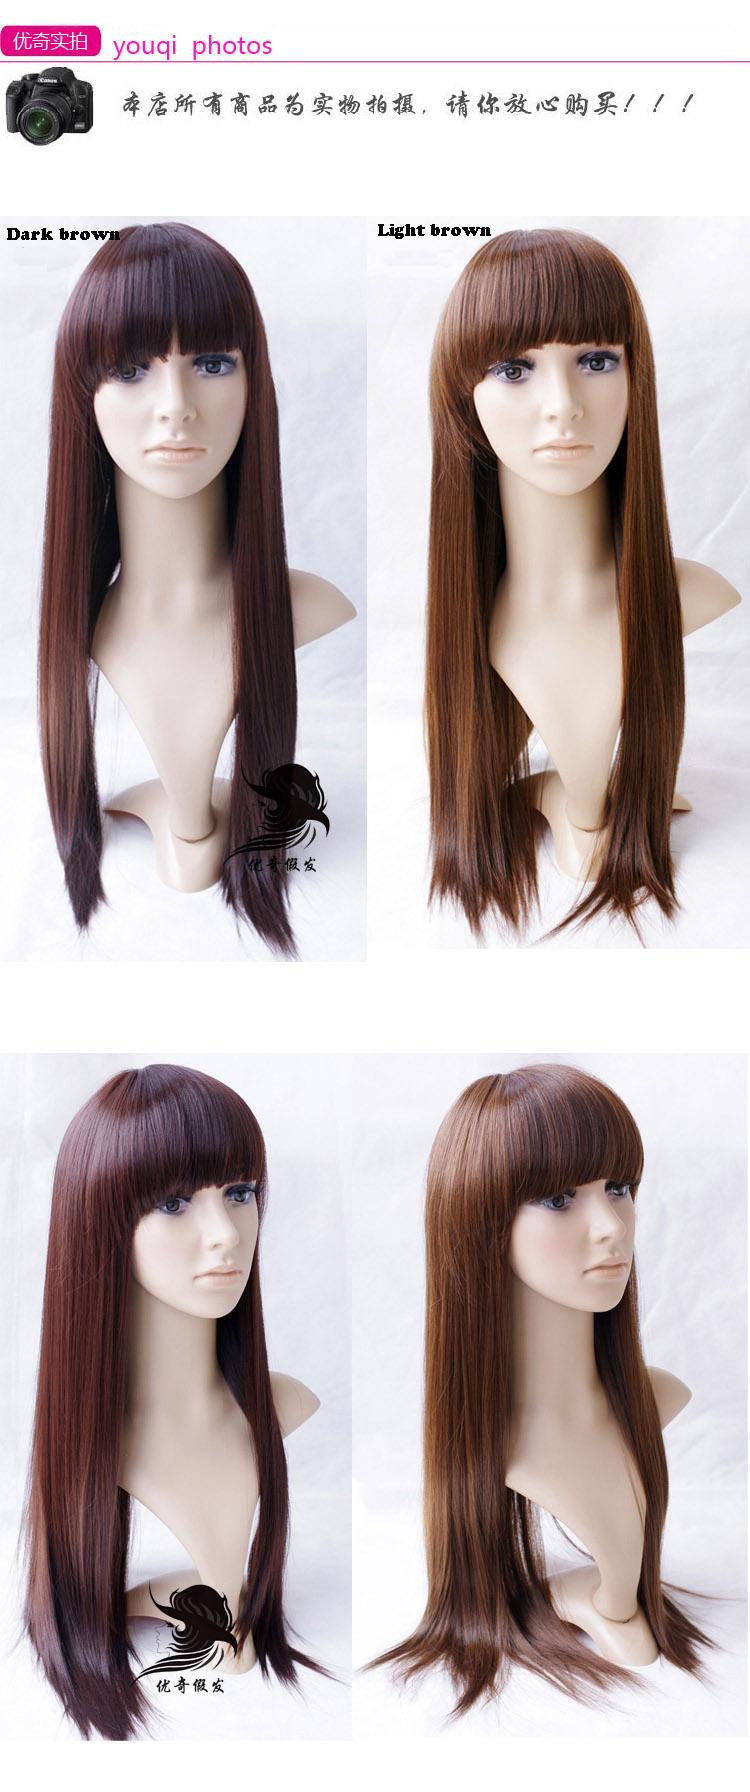 Glattes glattes Haar des geraden sexy Haares